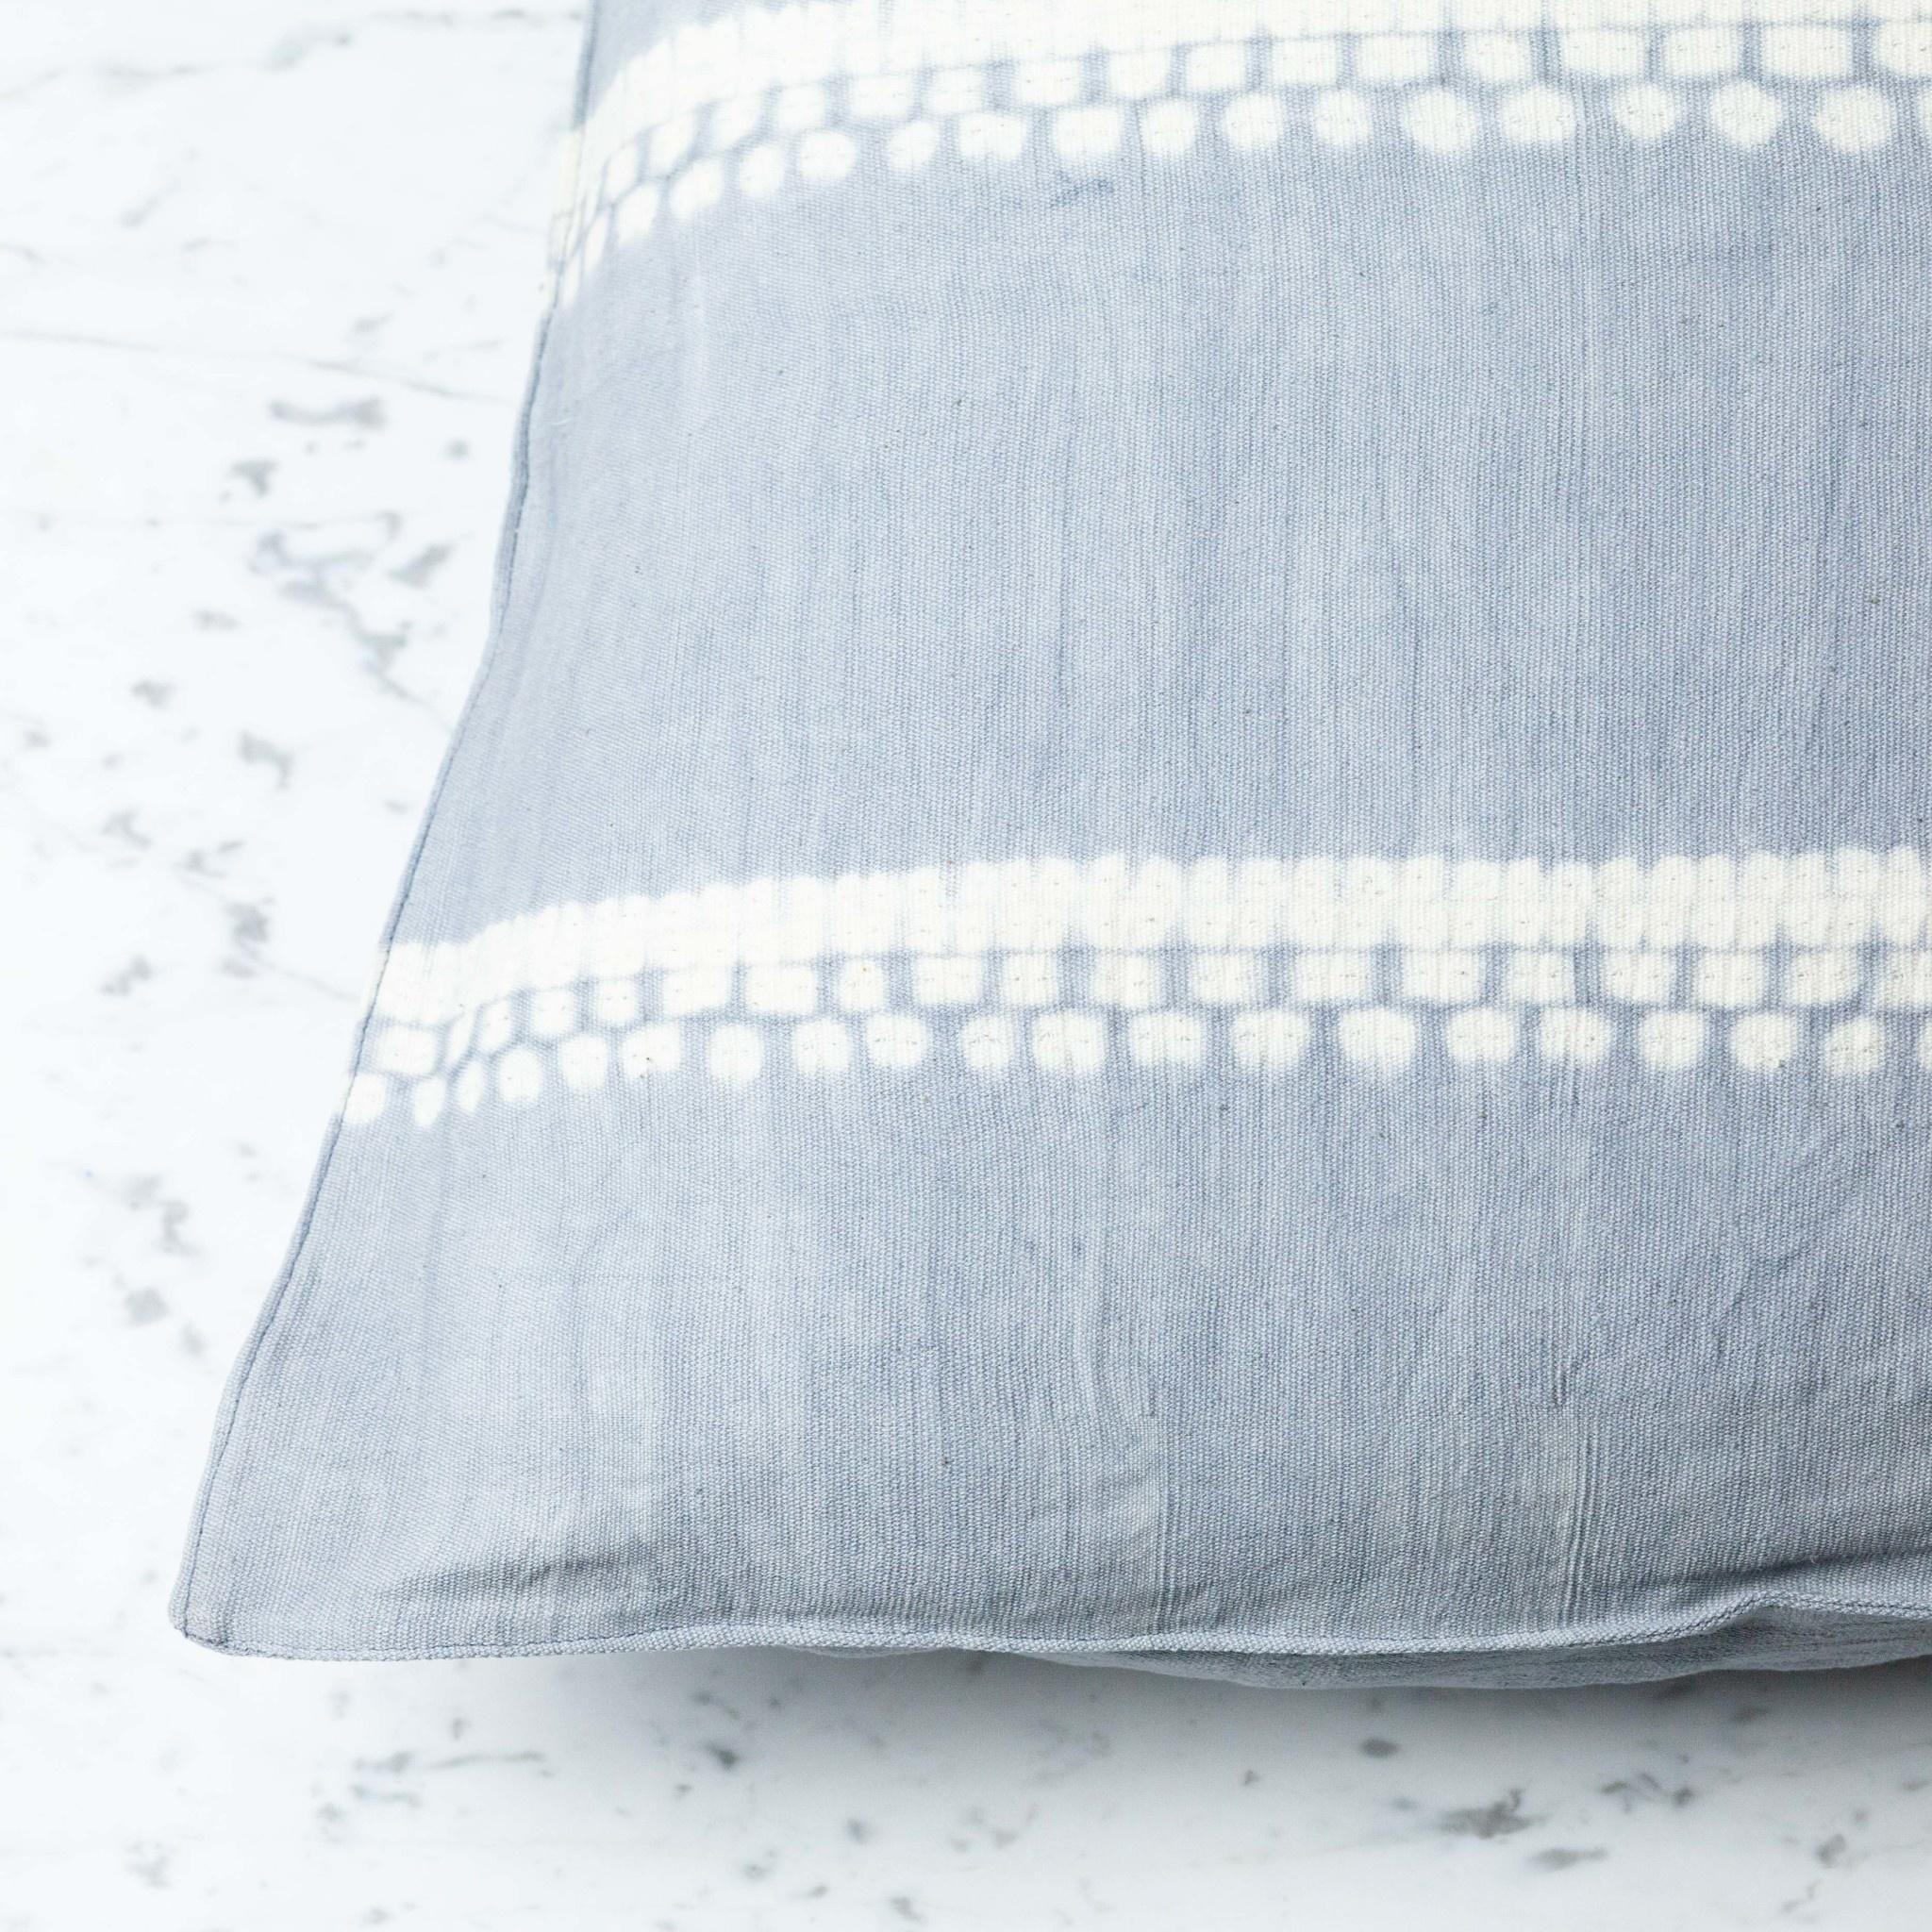 "TENSIRA 16 x 16"" - Handwoven Cotton Pillow with Down Insert - Button Closure - Grey Spotty Stitch Dye Stripes"